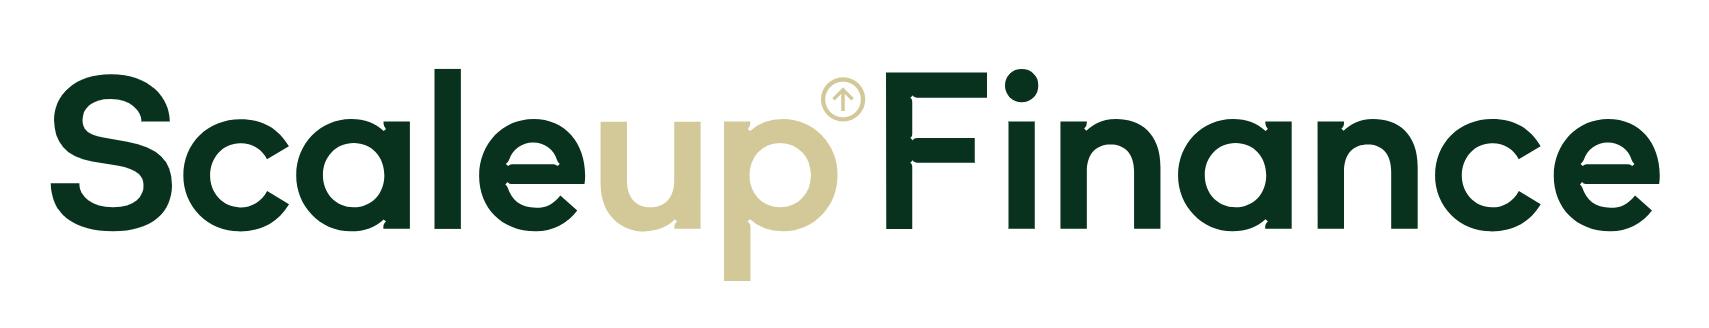 Scaleup Finance